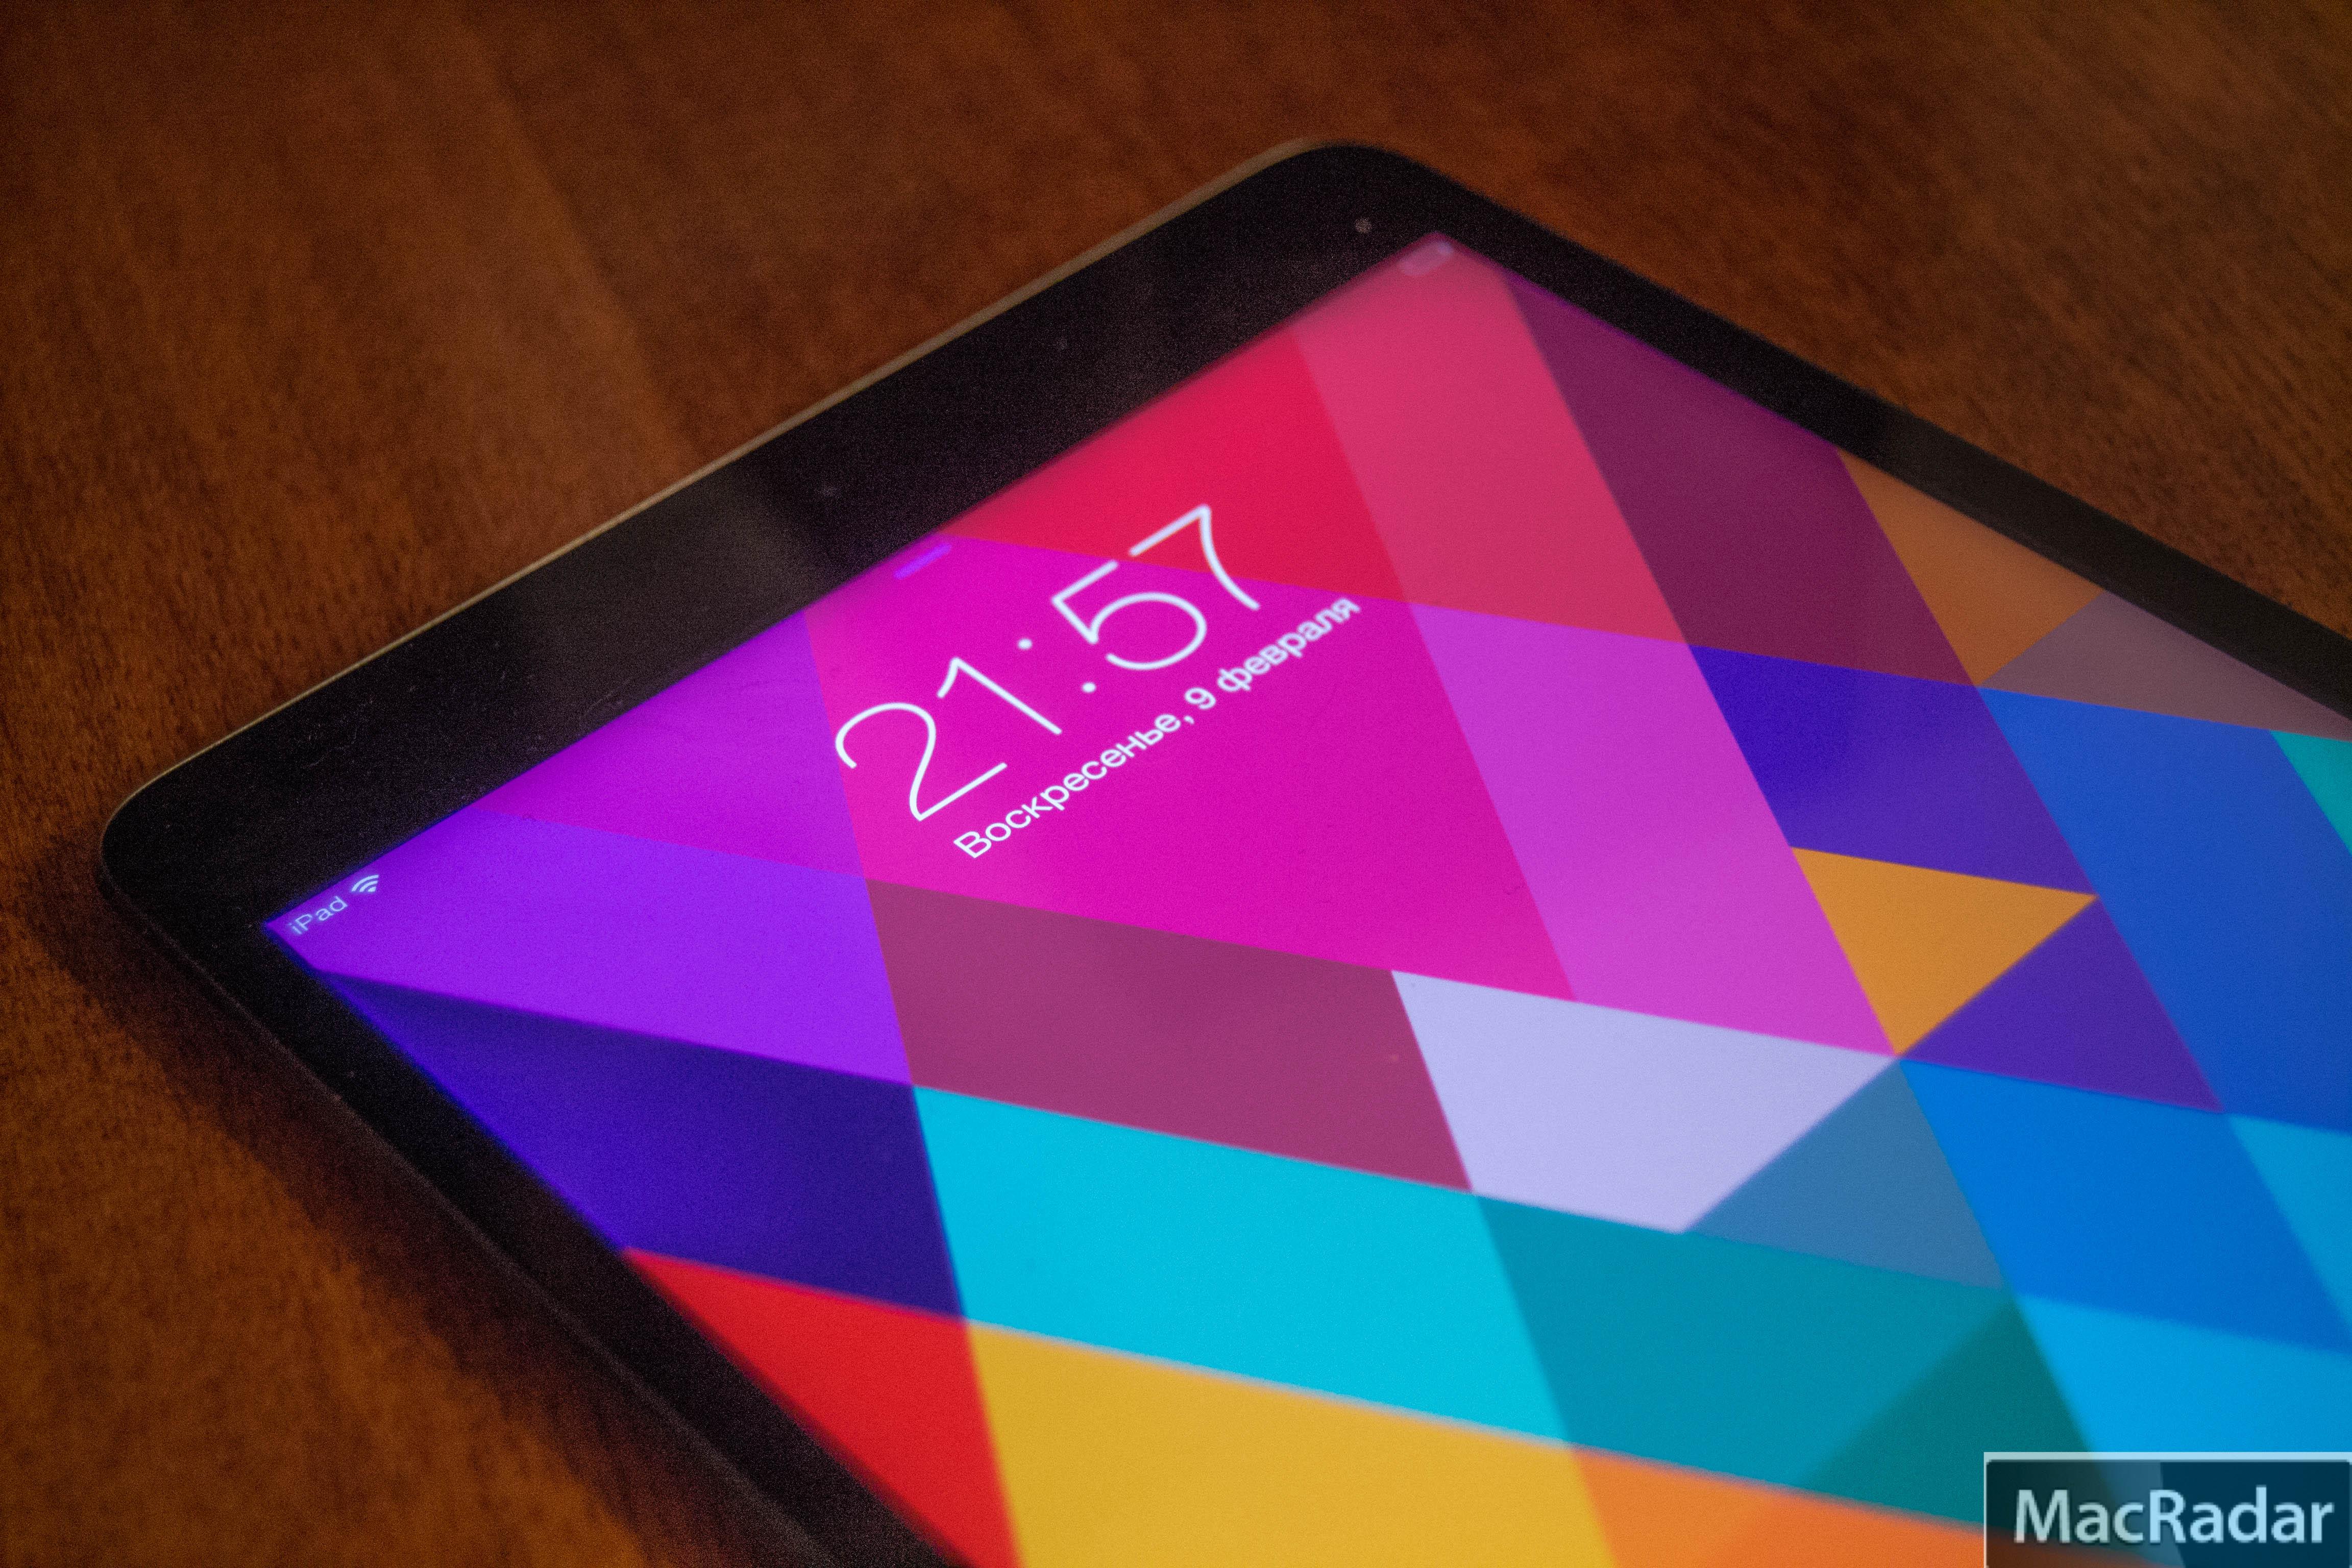 Обзор и опыт эксплуатации iPad mini с дисплеем Retina